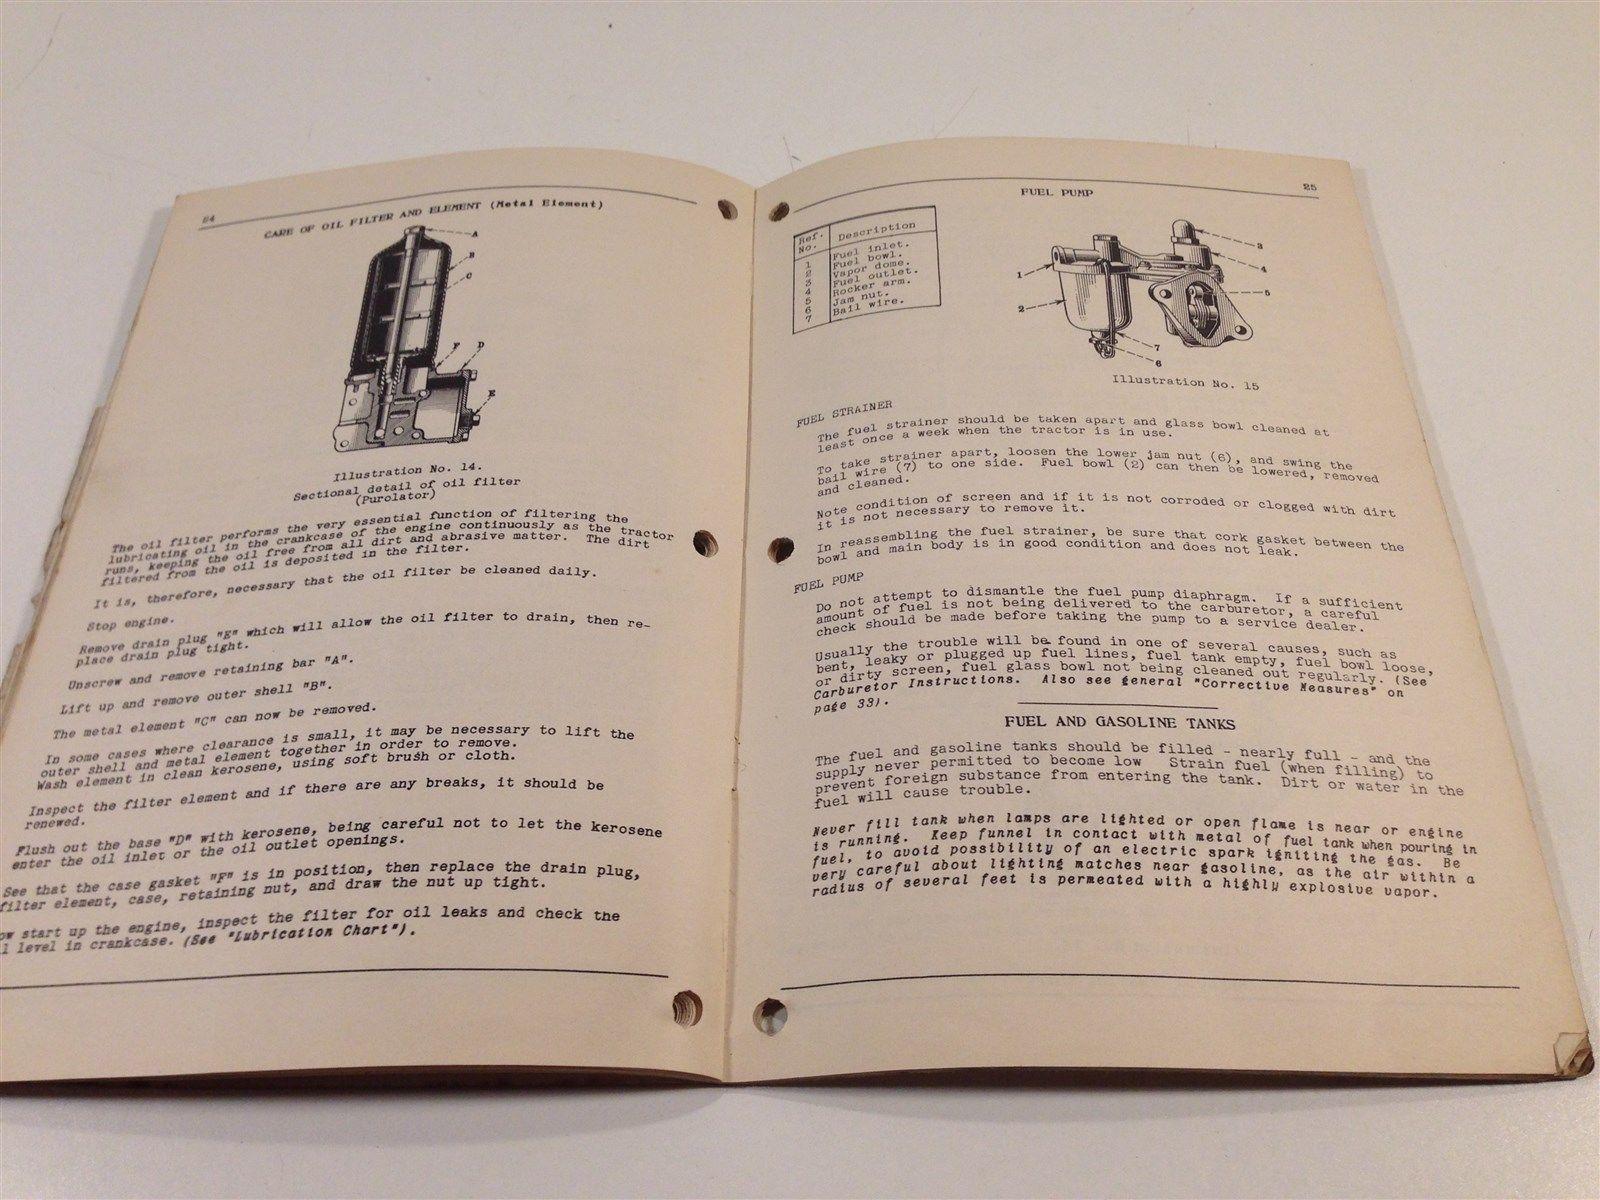 Vintage McCormick-Deering Farmall F-12 Tractor Instruction Manual Book 1949